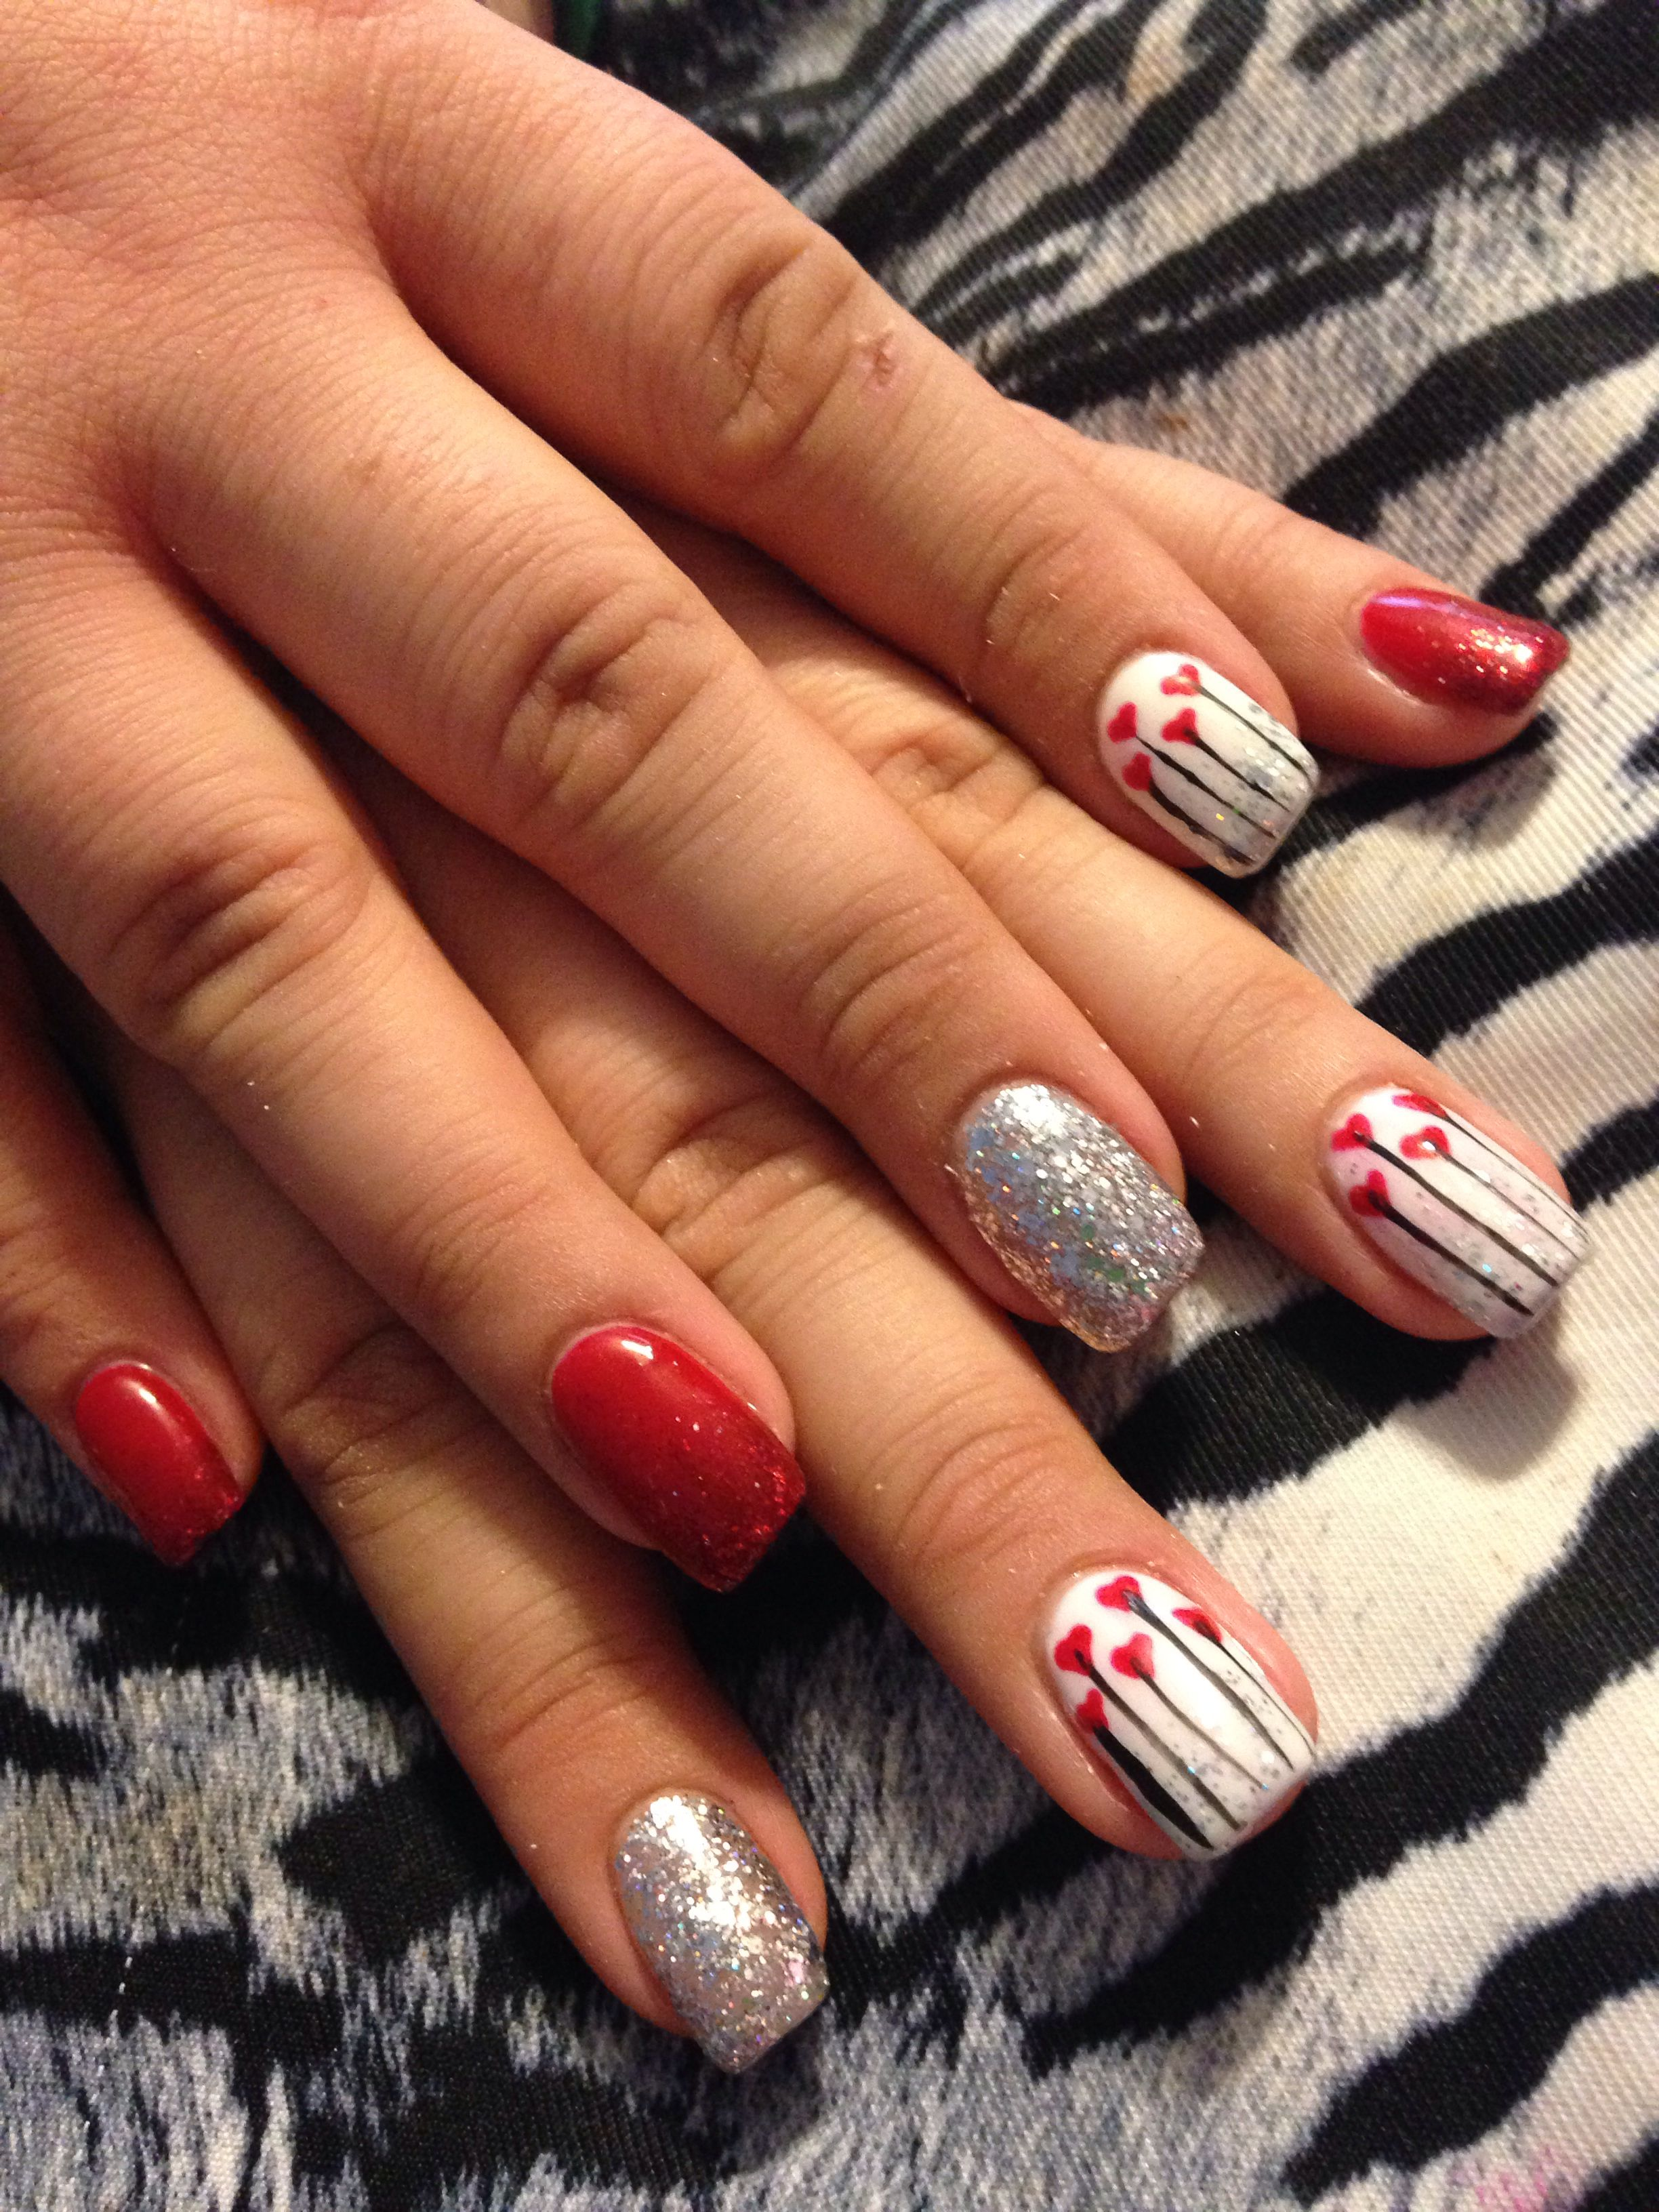 Acrylic nail design valentine's day   Sara's nail designs ...